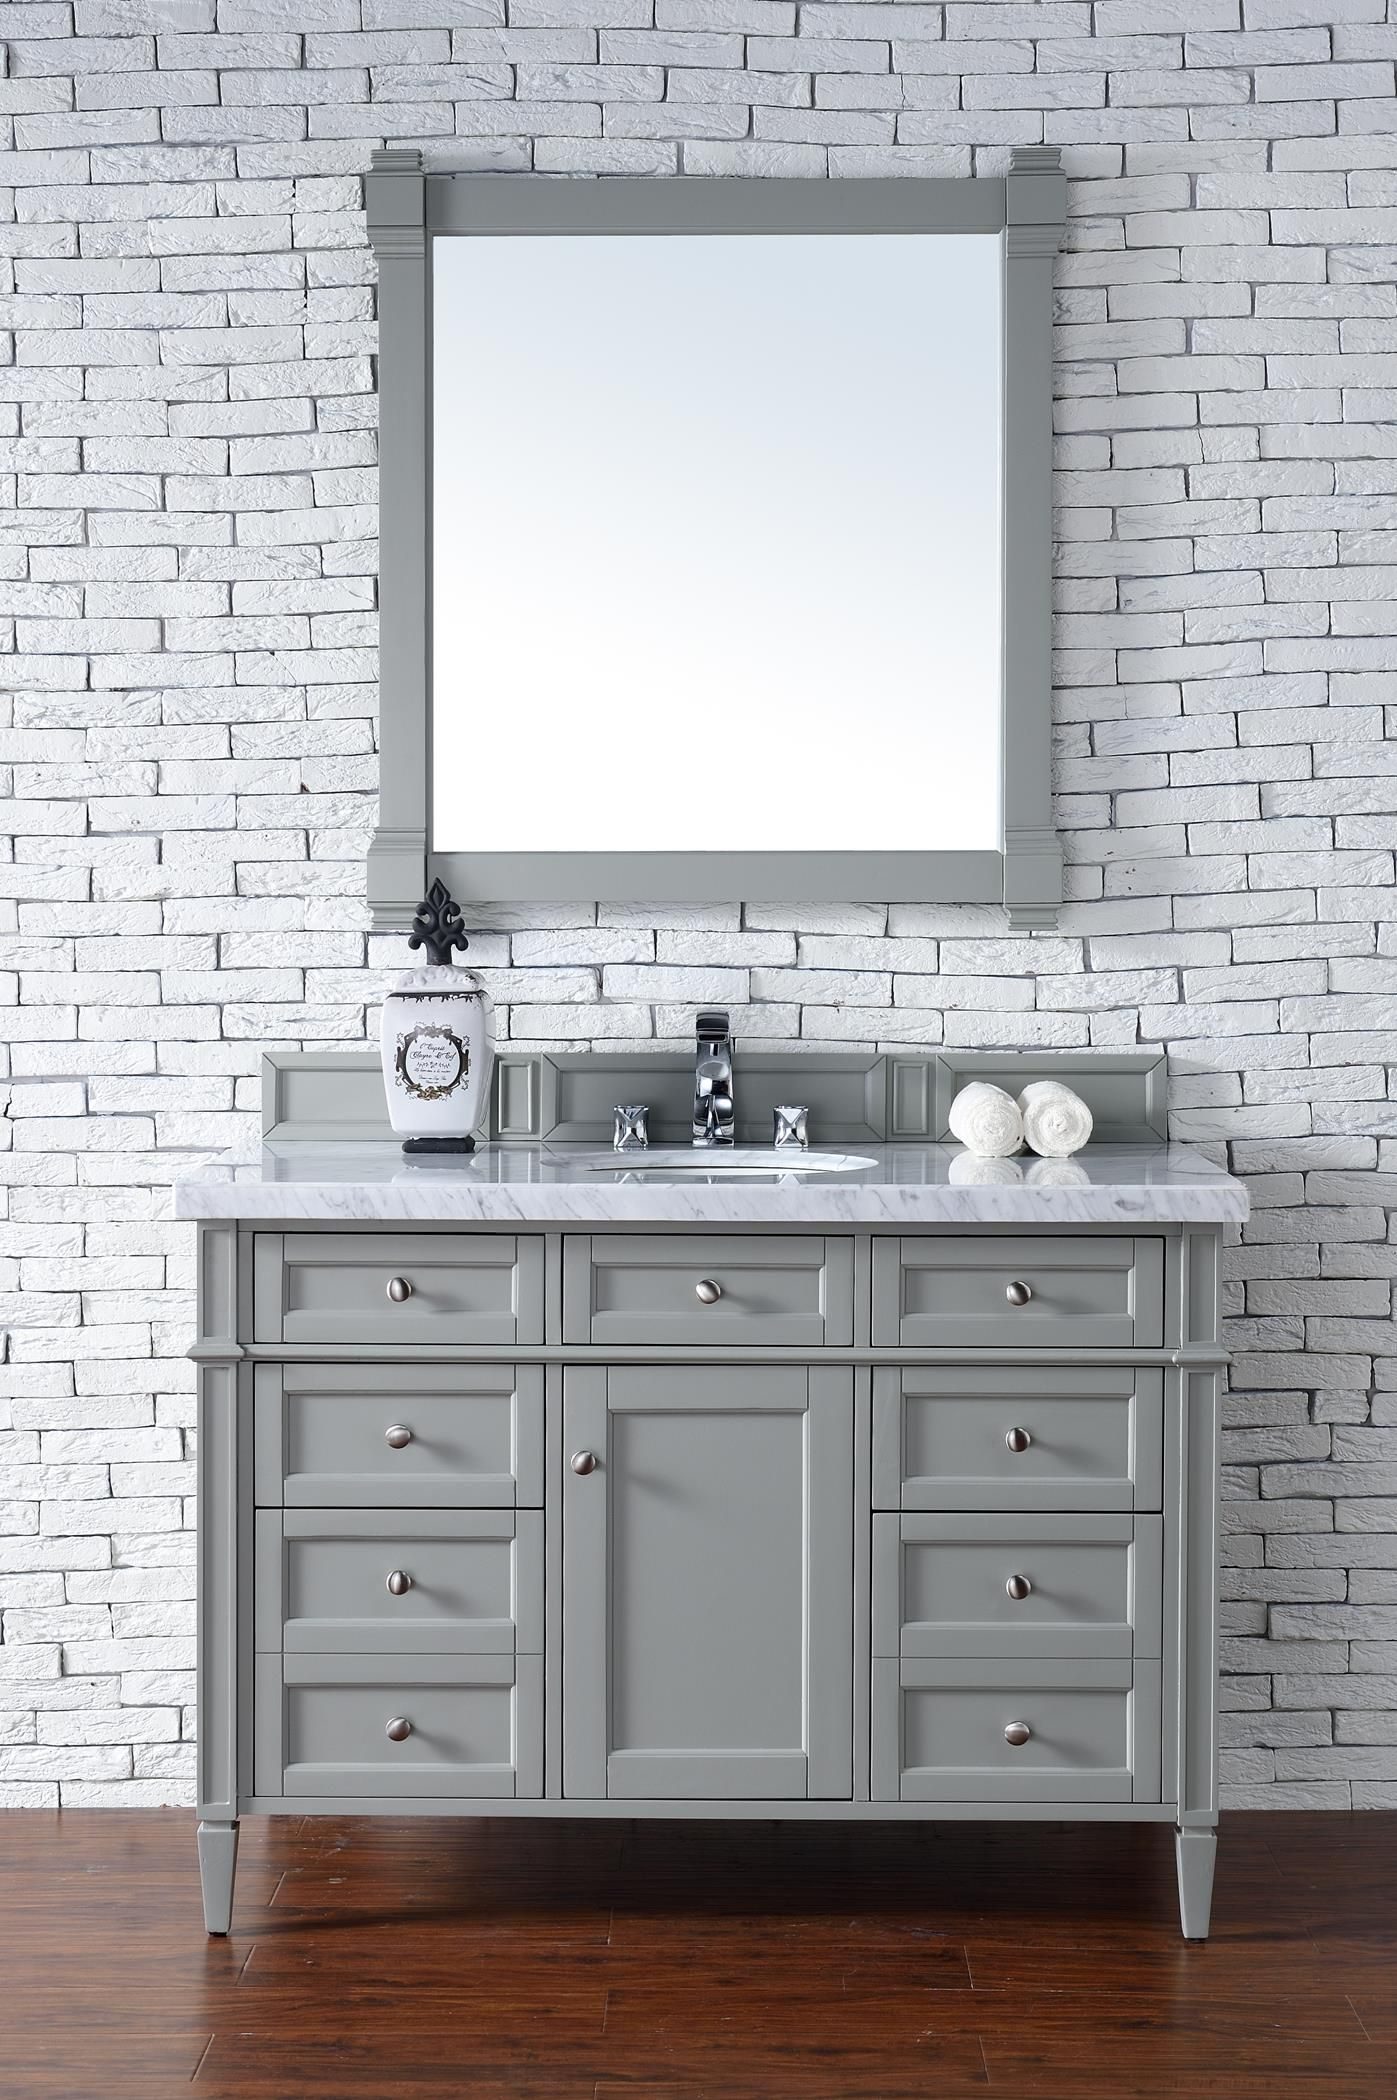 Brittany 48 Single Sink Bathroom Vanity Cabinet Urban Gray Finish Carrara Grey Bathroom Vanity Transitional Bathroom Vanities Single Sink Bathroom Vanity